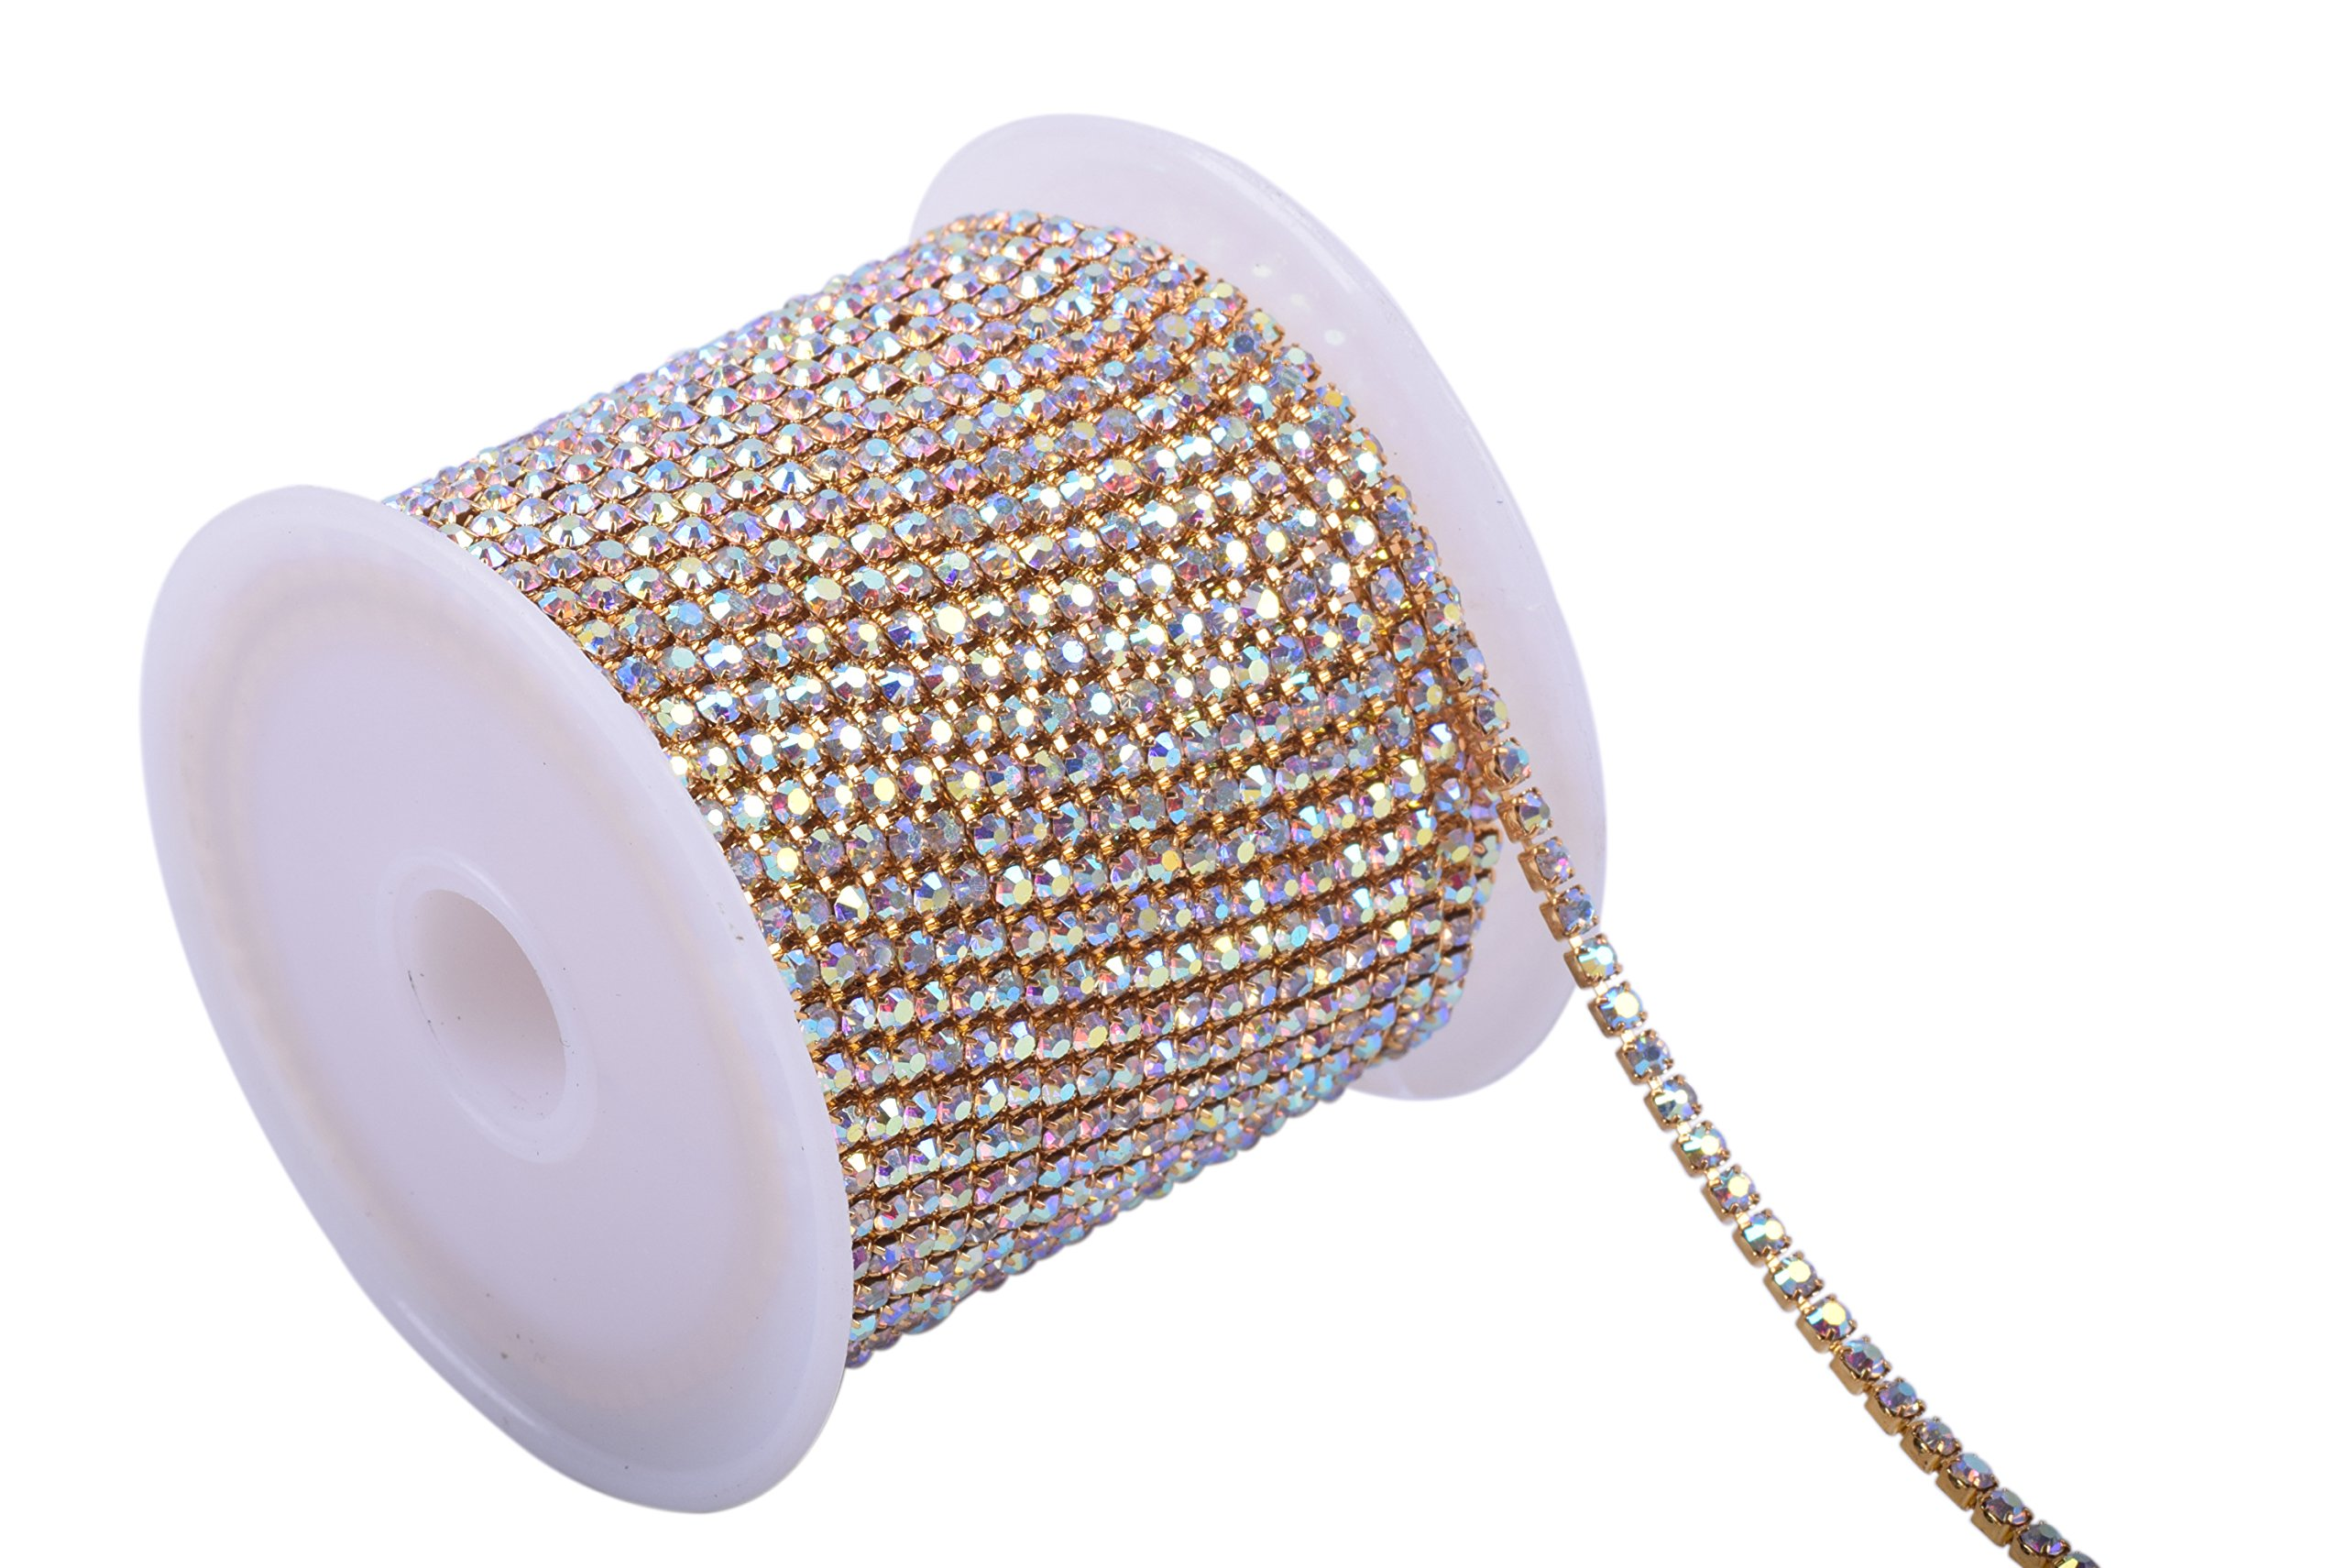 KAOYOO 10 Yards 2.5MM Crystal Rhinestone Close Chain Trim for Sewing Crafts,DIY Decoration